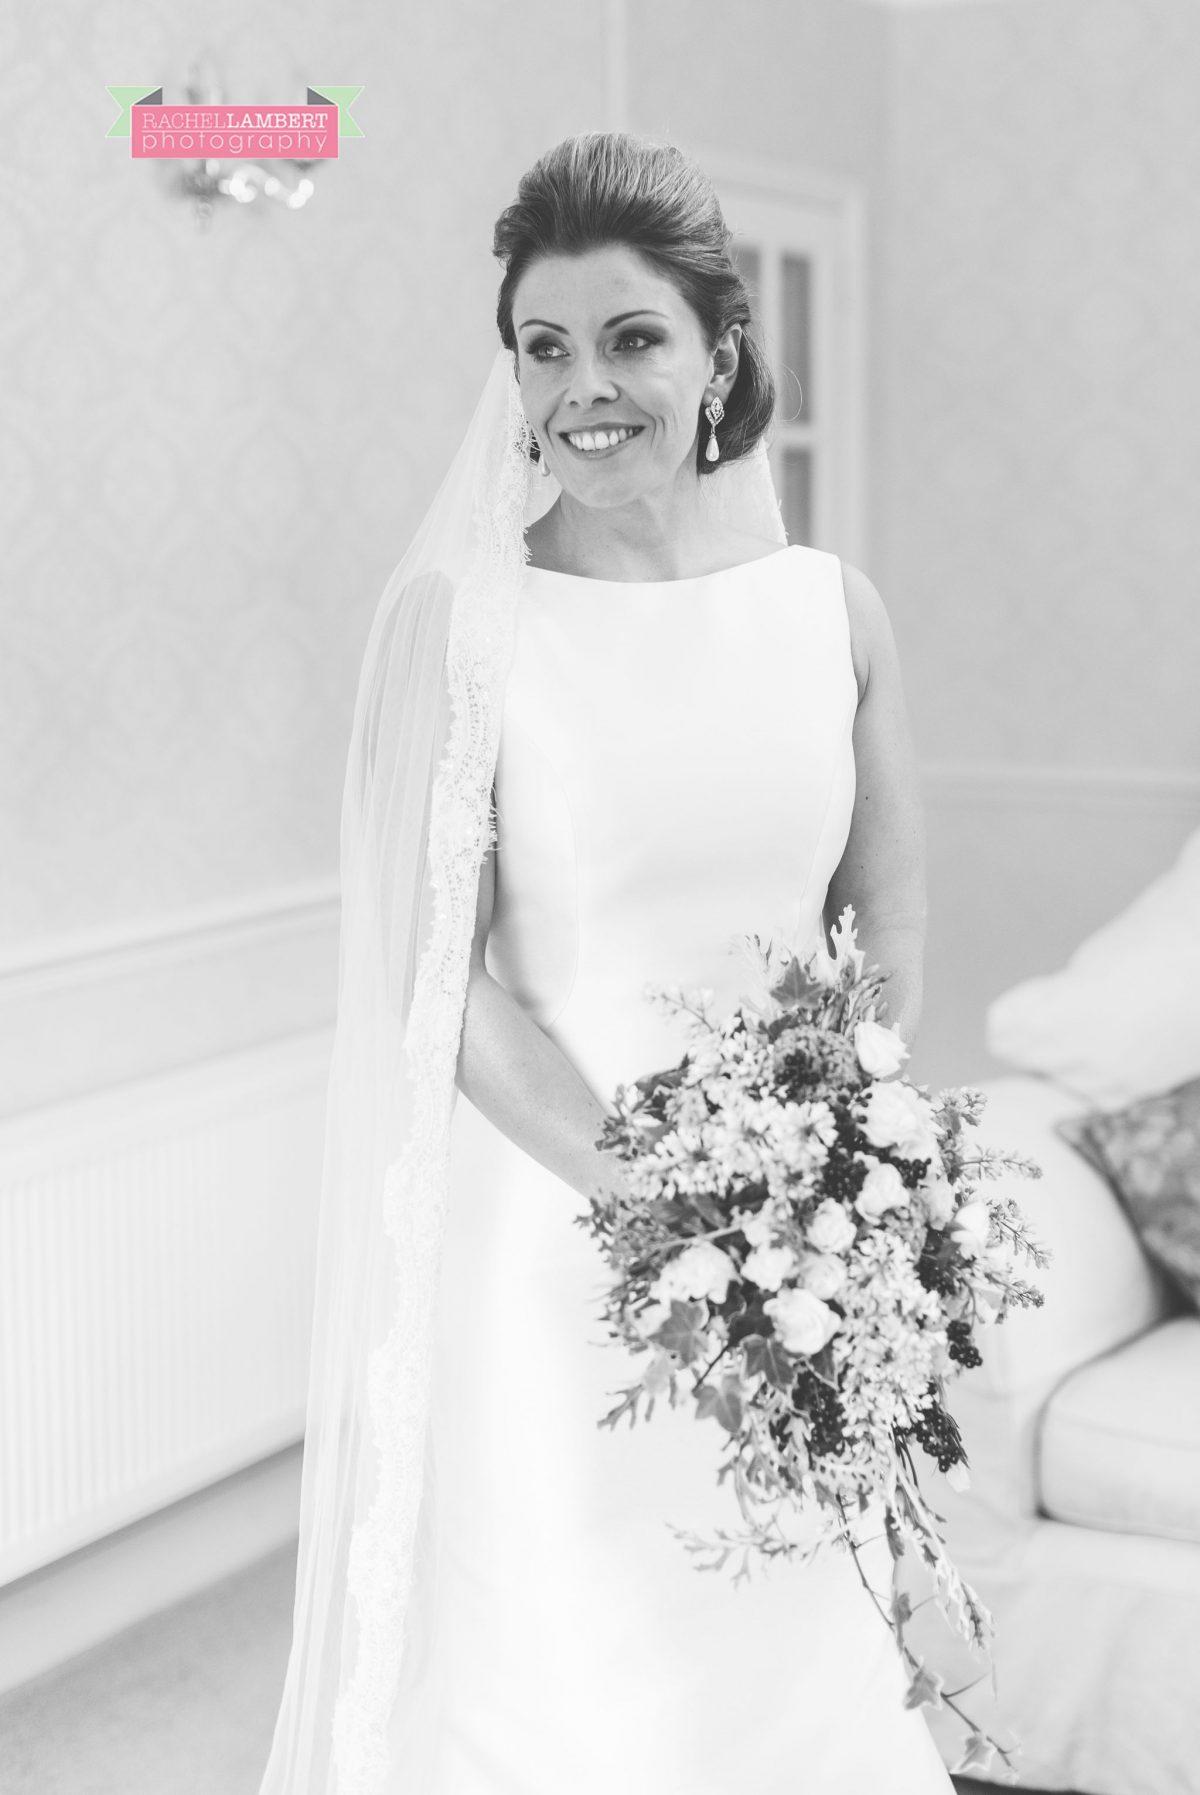 welsh_wedding_photographer_rachel_lambert_photography_decourceys_manor_cardiff_ceri_chris_ 11